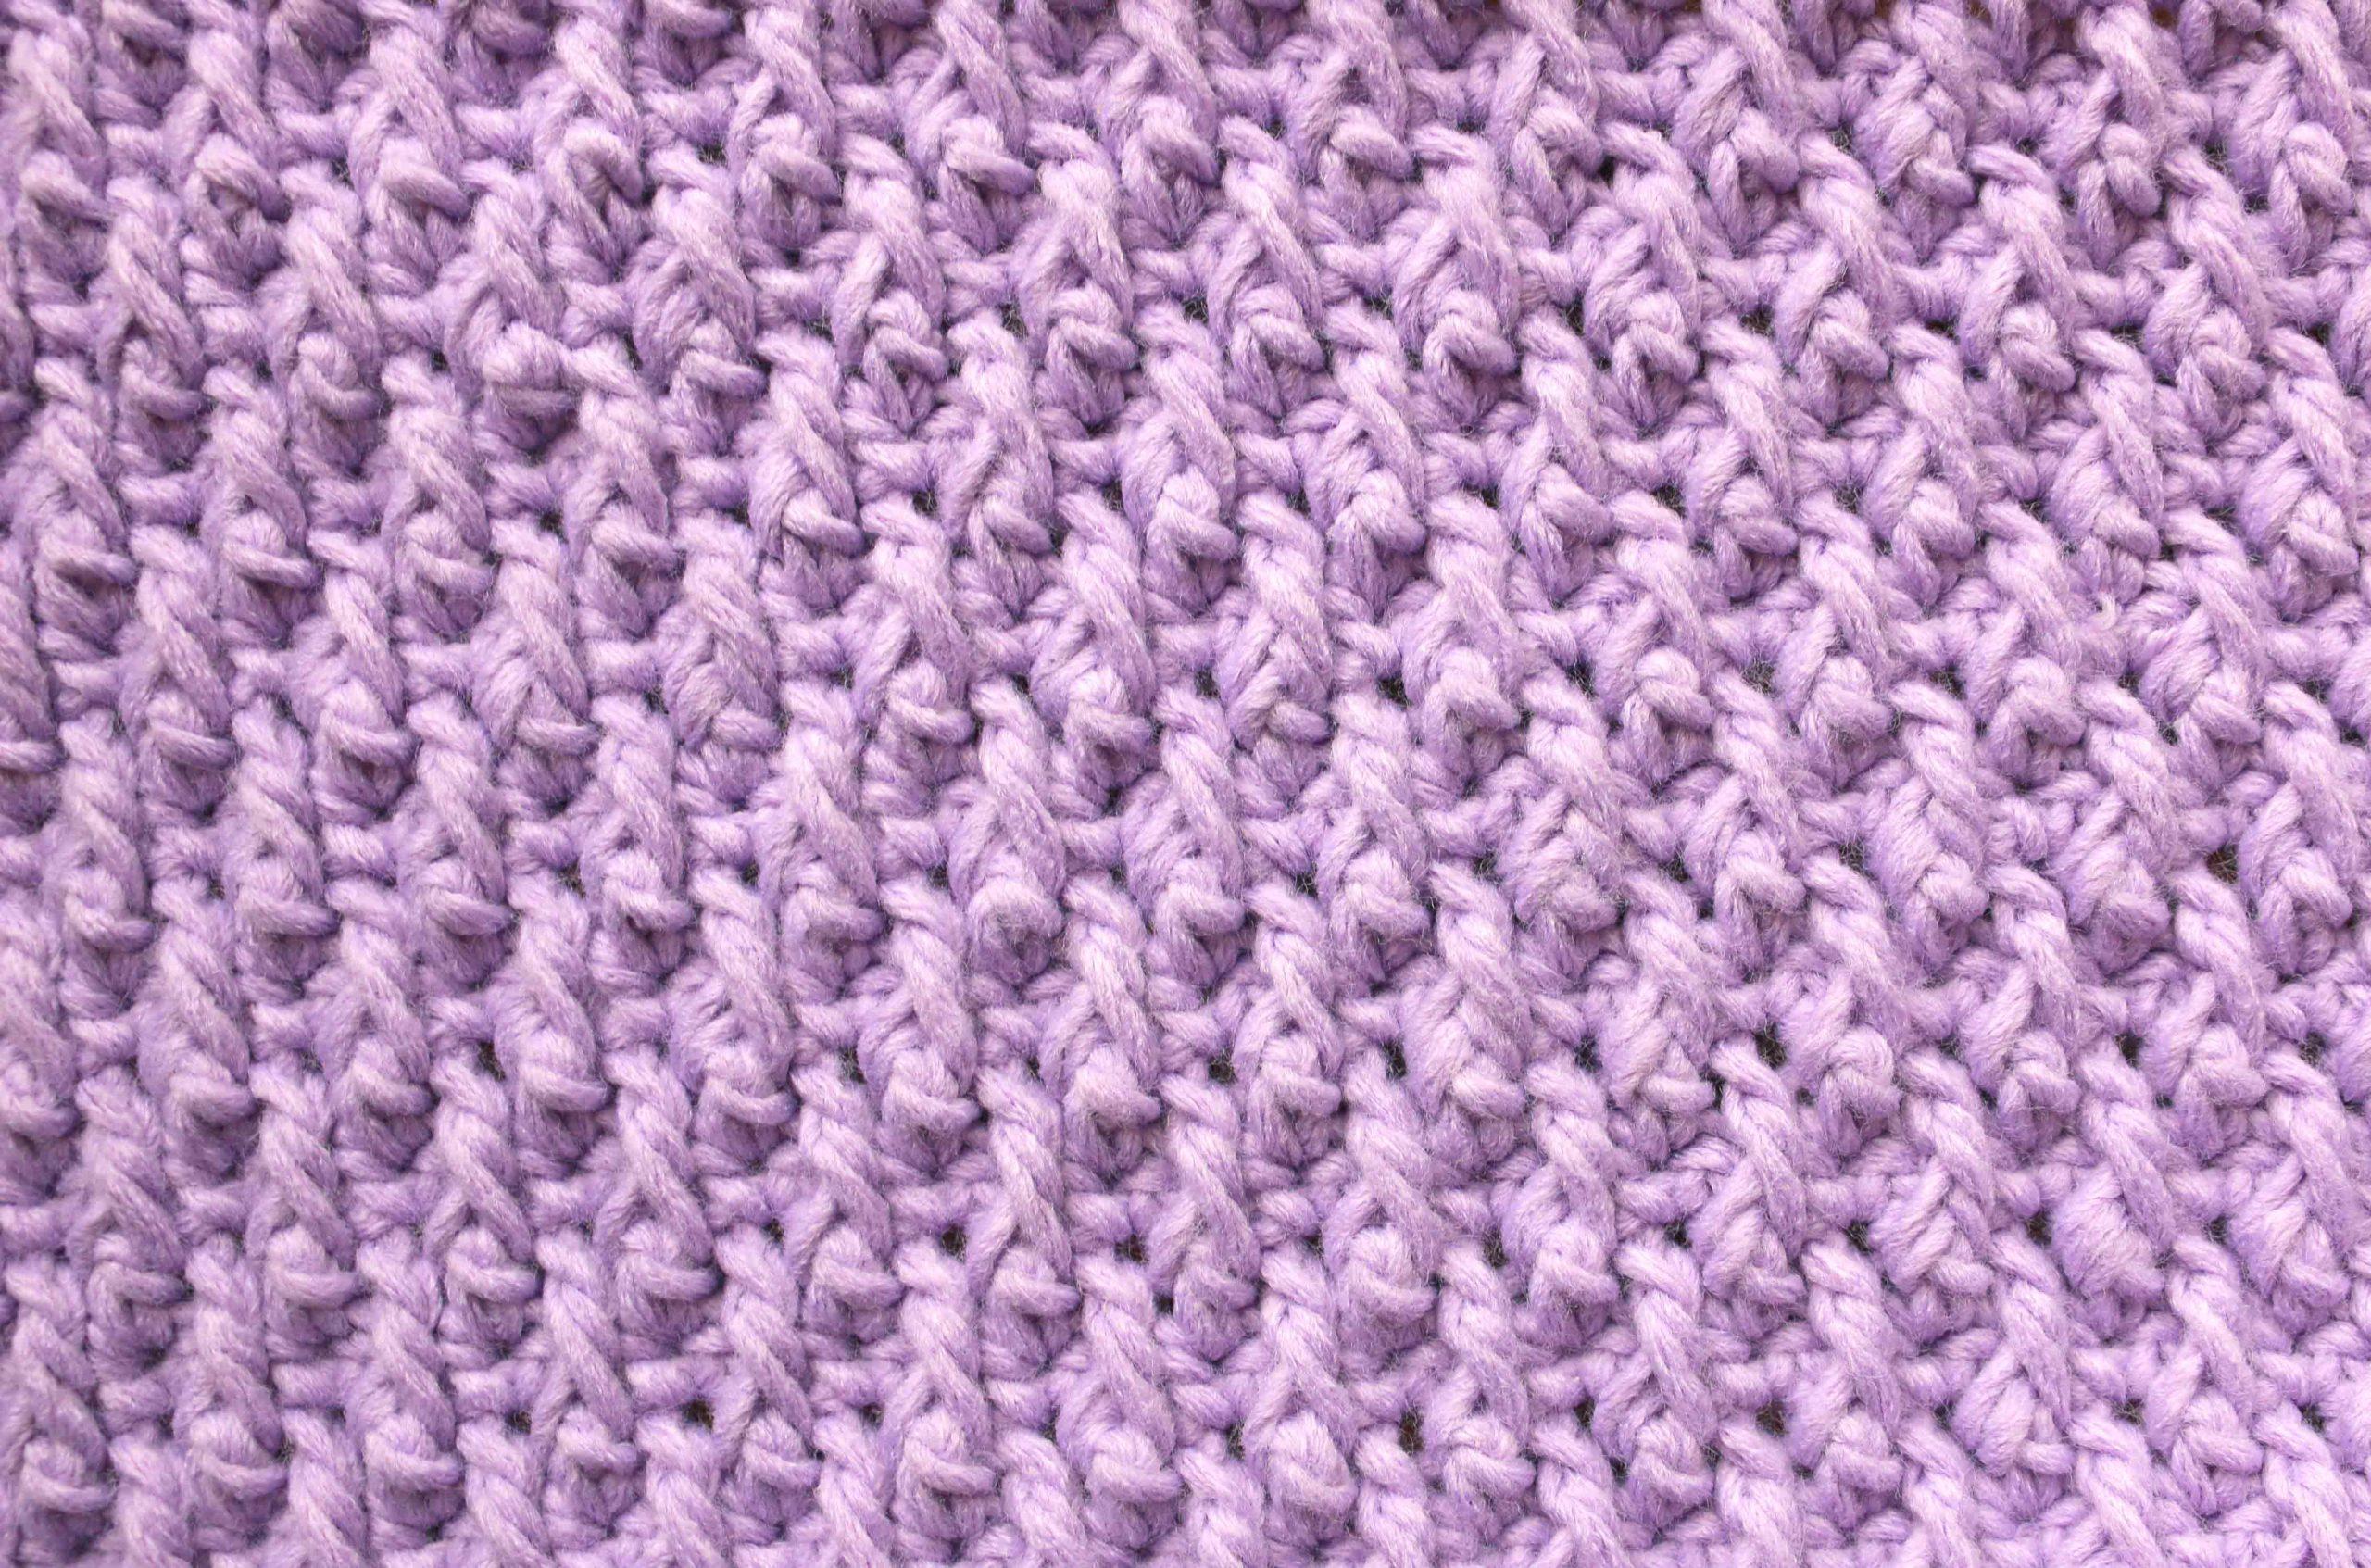 alpine stitch punto alpino crochet ganchillo patron gratis free pattern